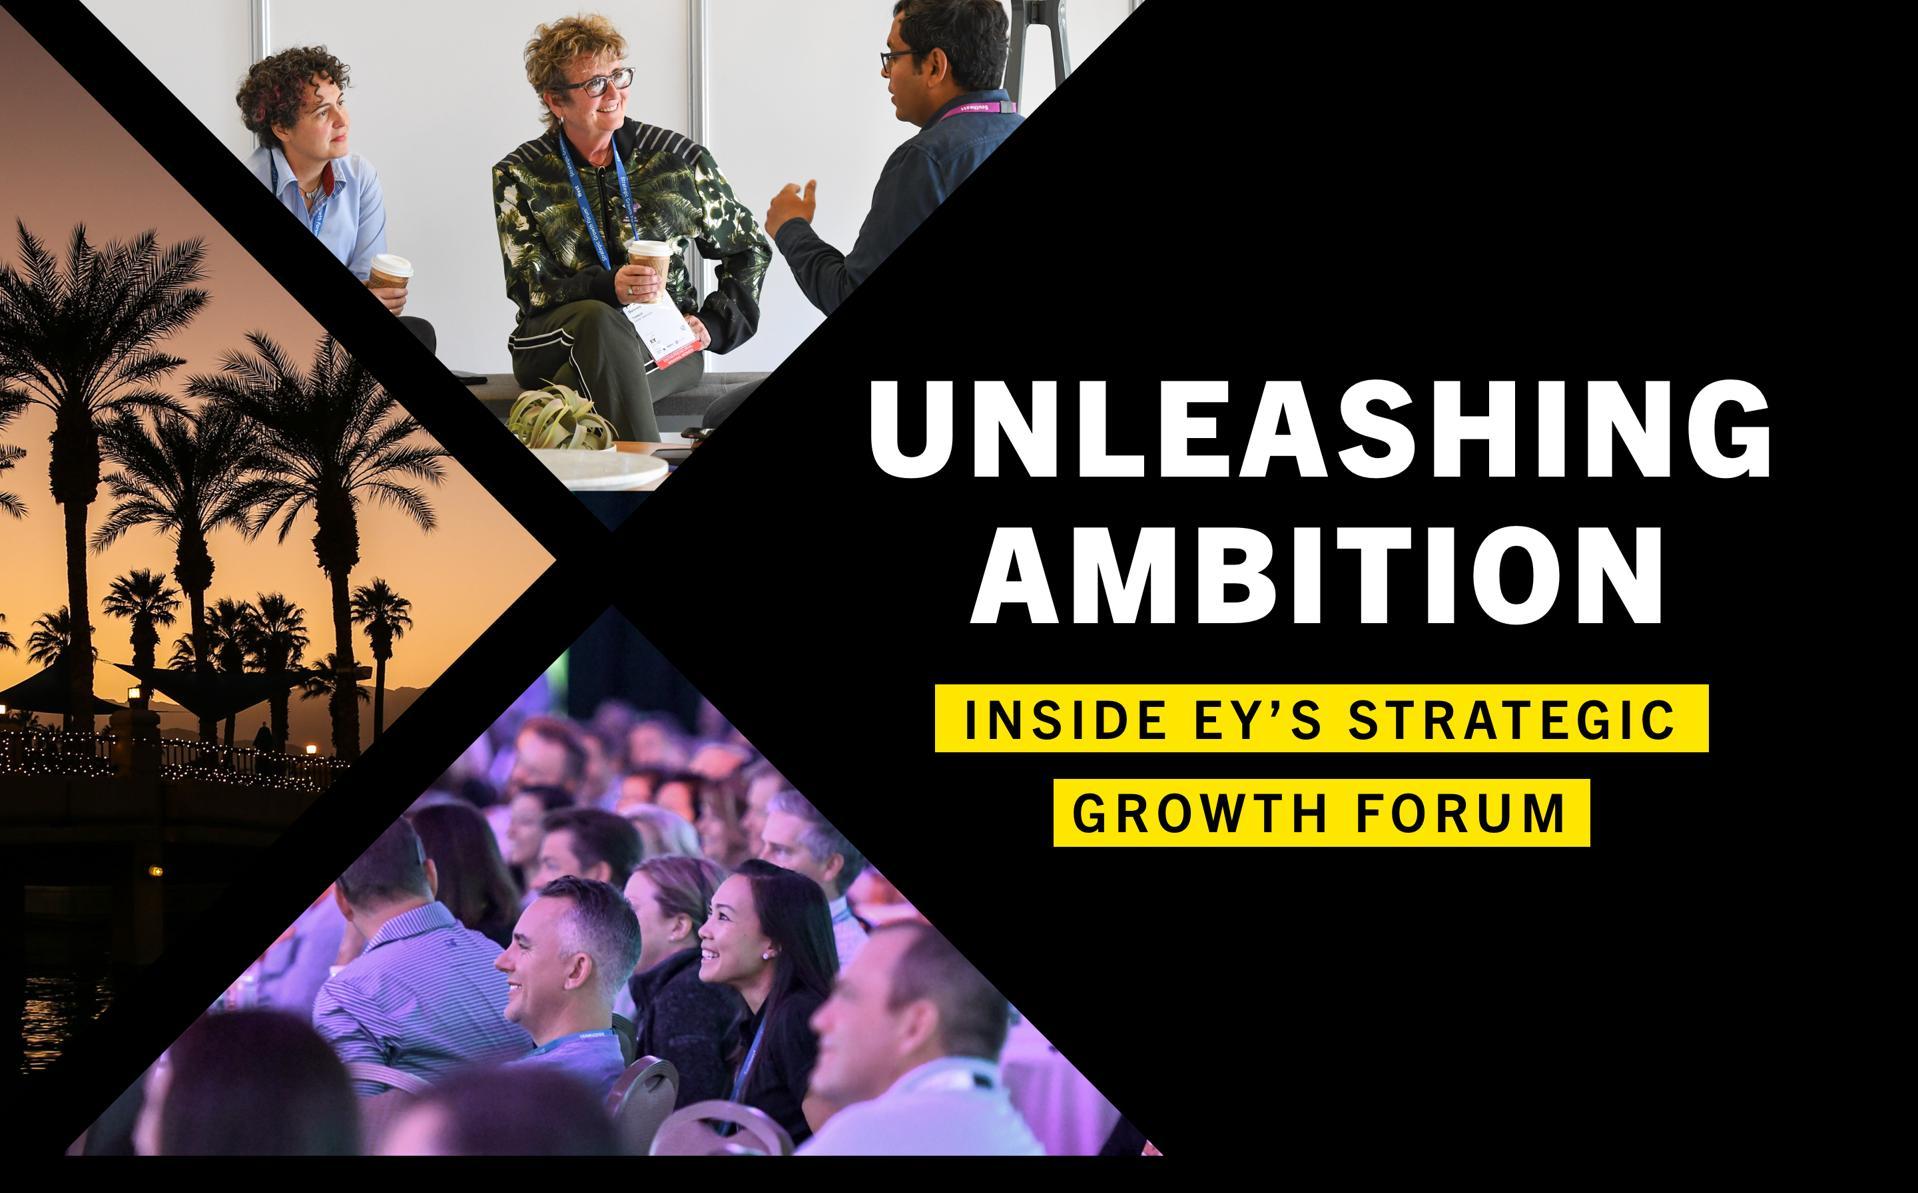 Unleashing Ambition: Inside EY's Strategic Growth Forum